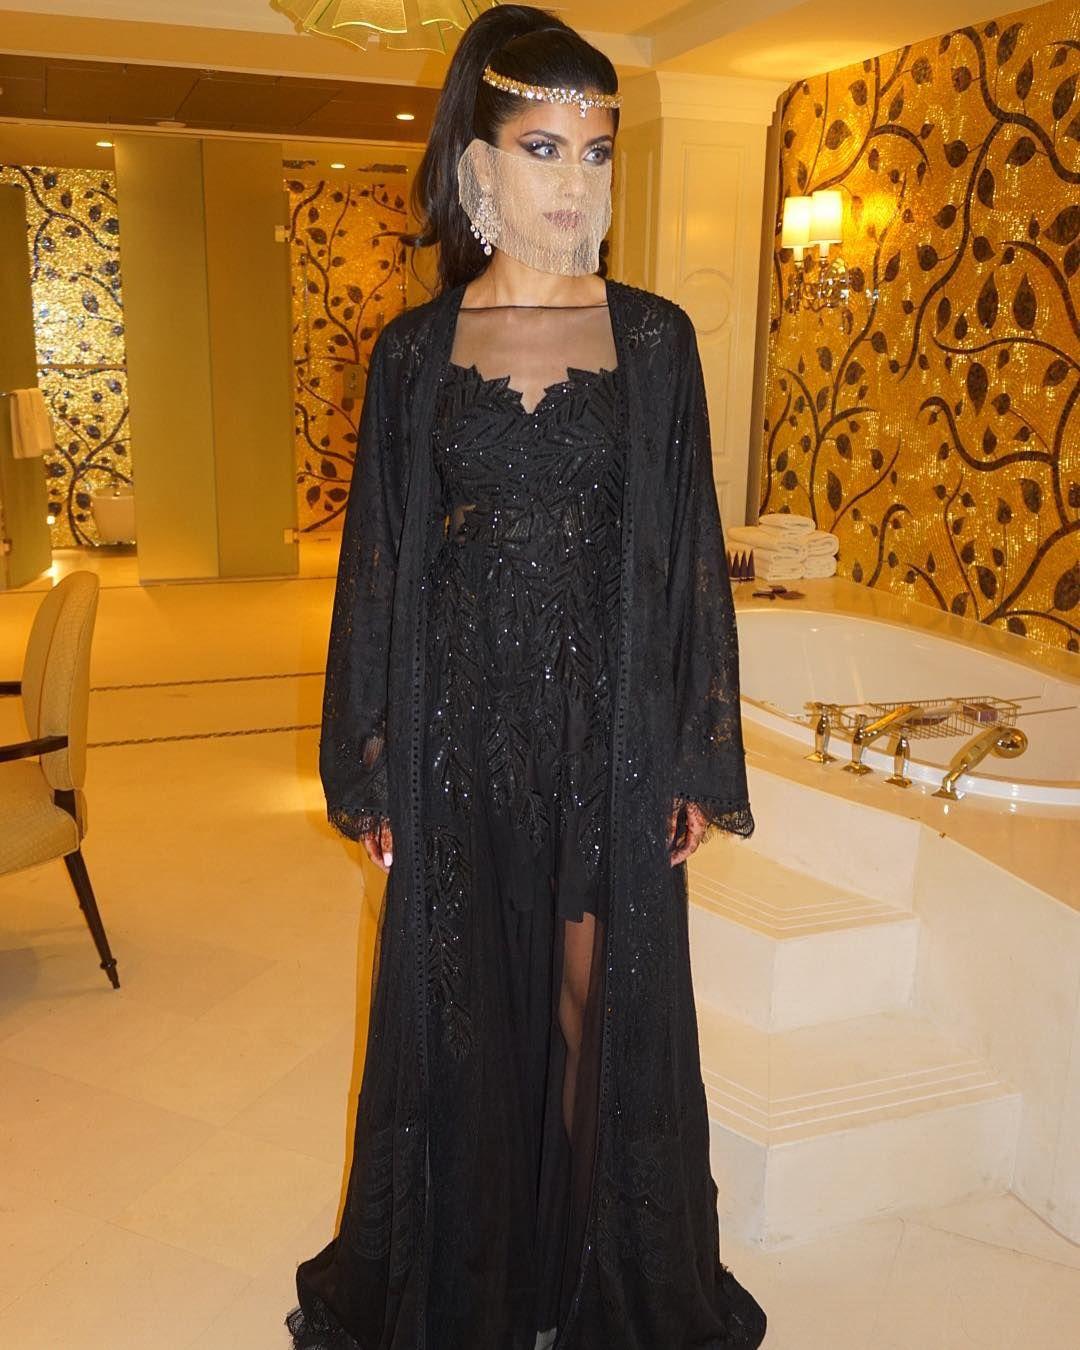 arabian nights theme party dress – Fashion dresses  |Arabian Nights Theme Party Dress